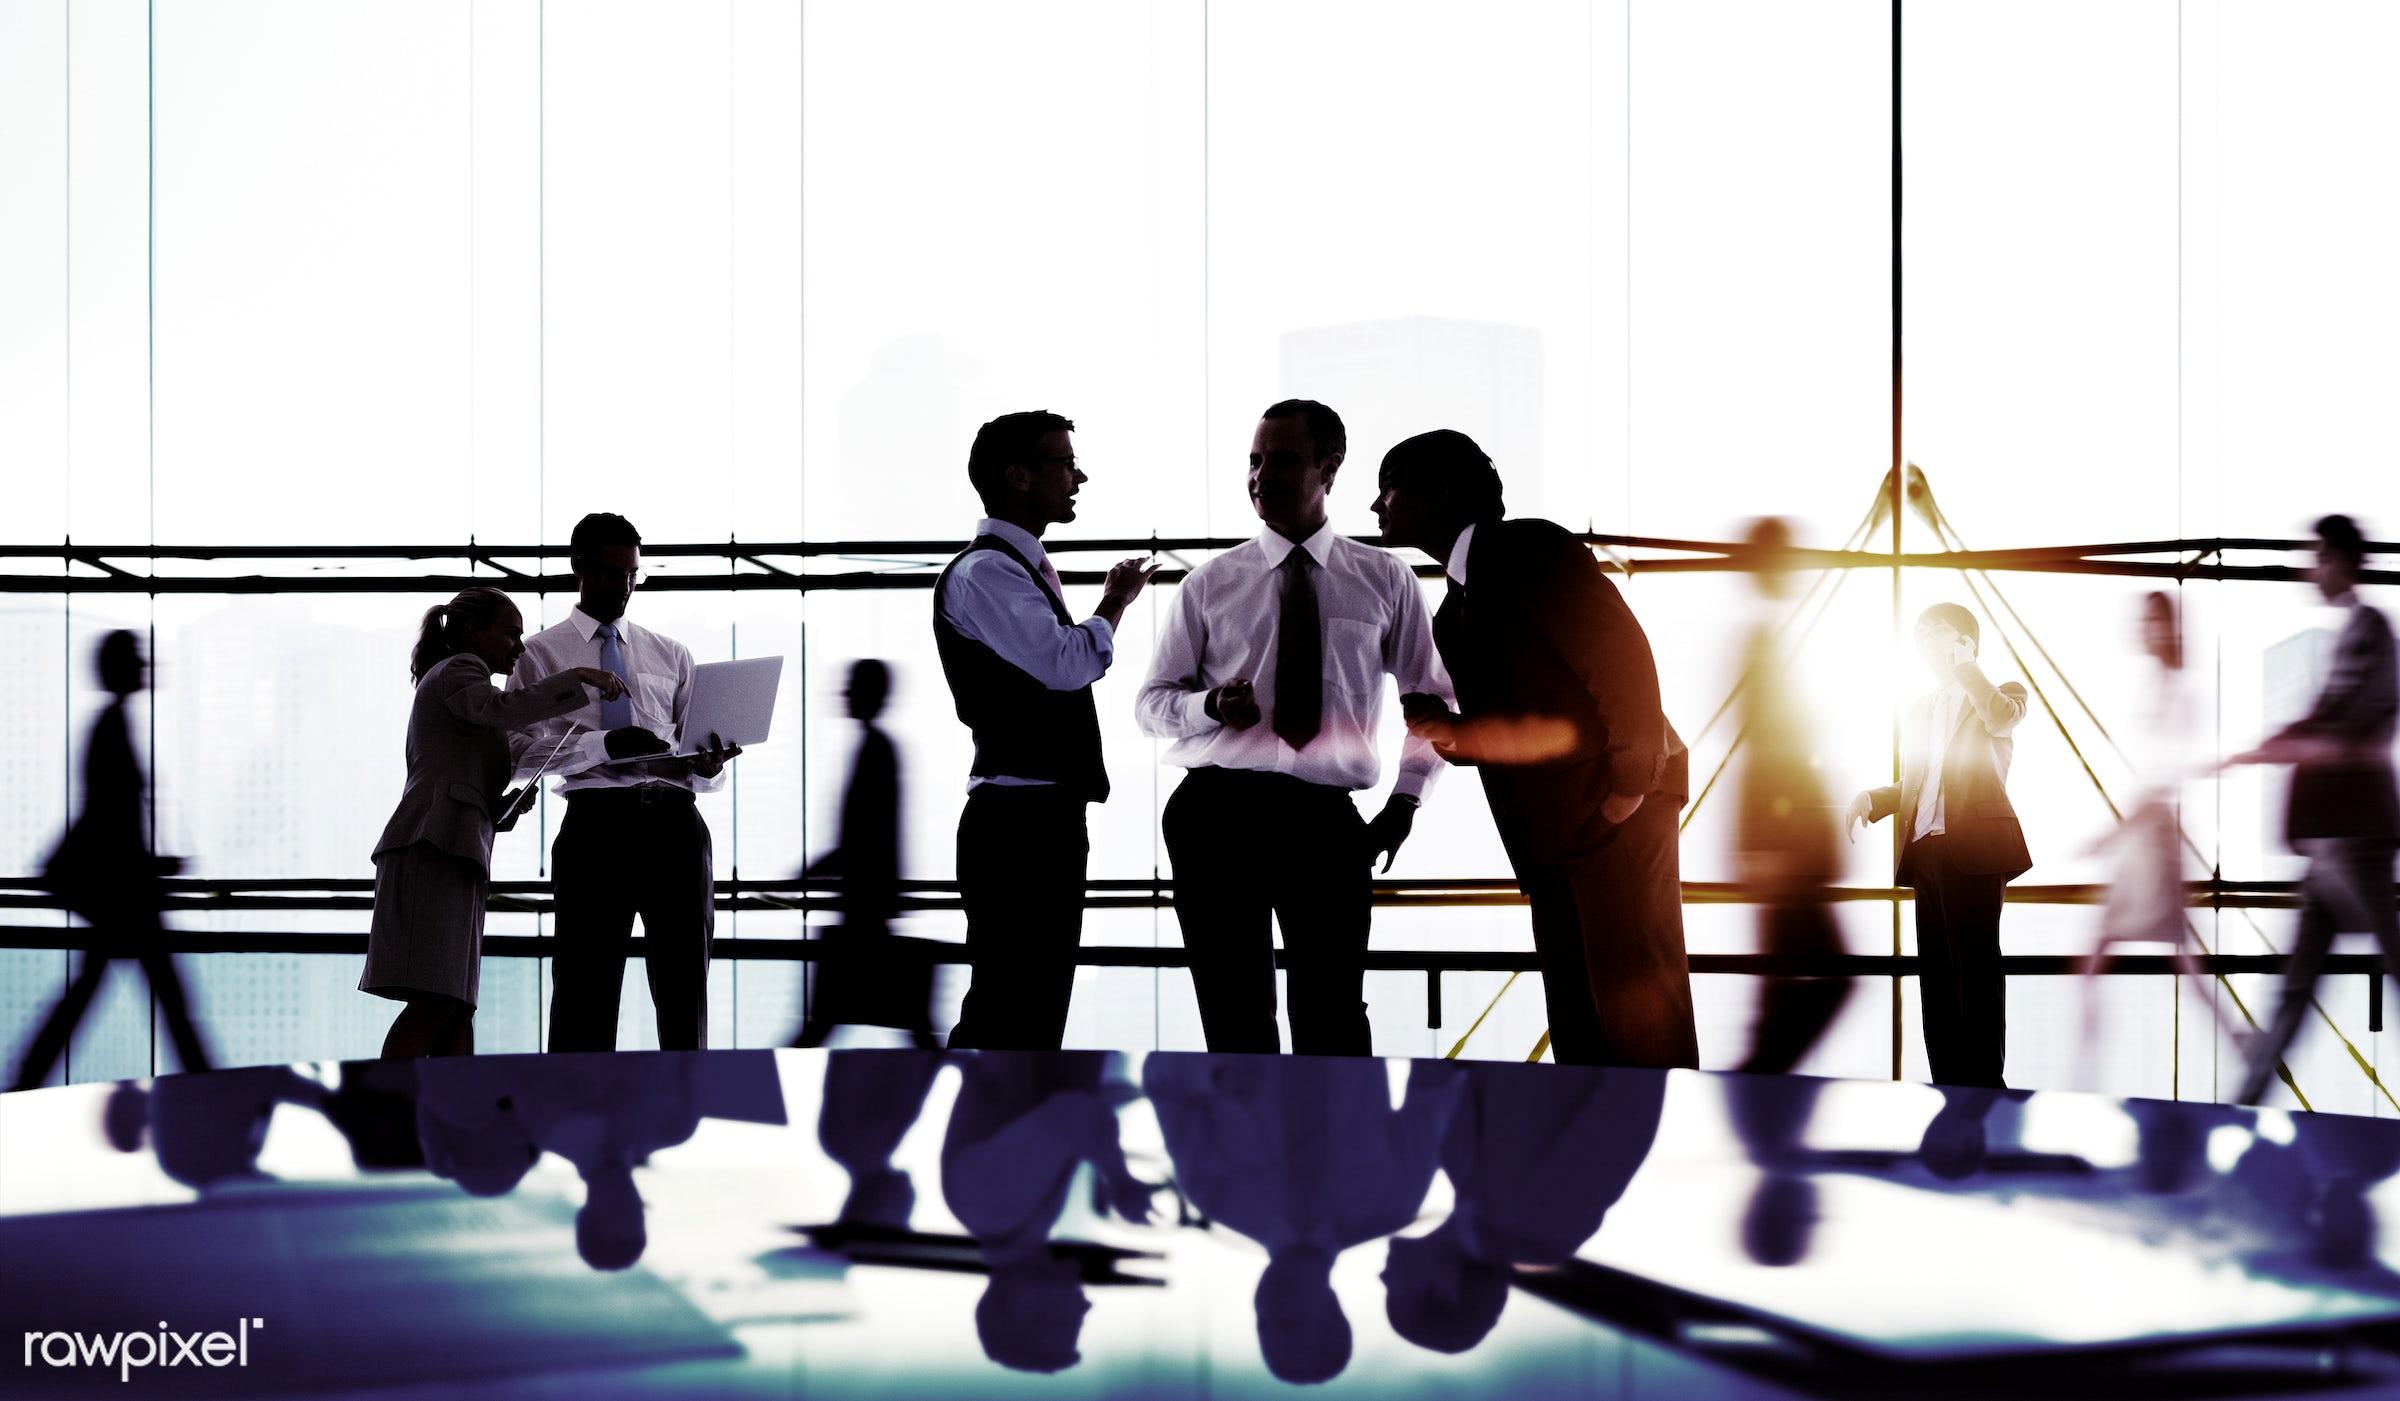 adult, asian ethnicity, back lit, brainstorming, building, business, business people, businessmen, businesswomen, city, city...